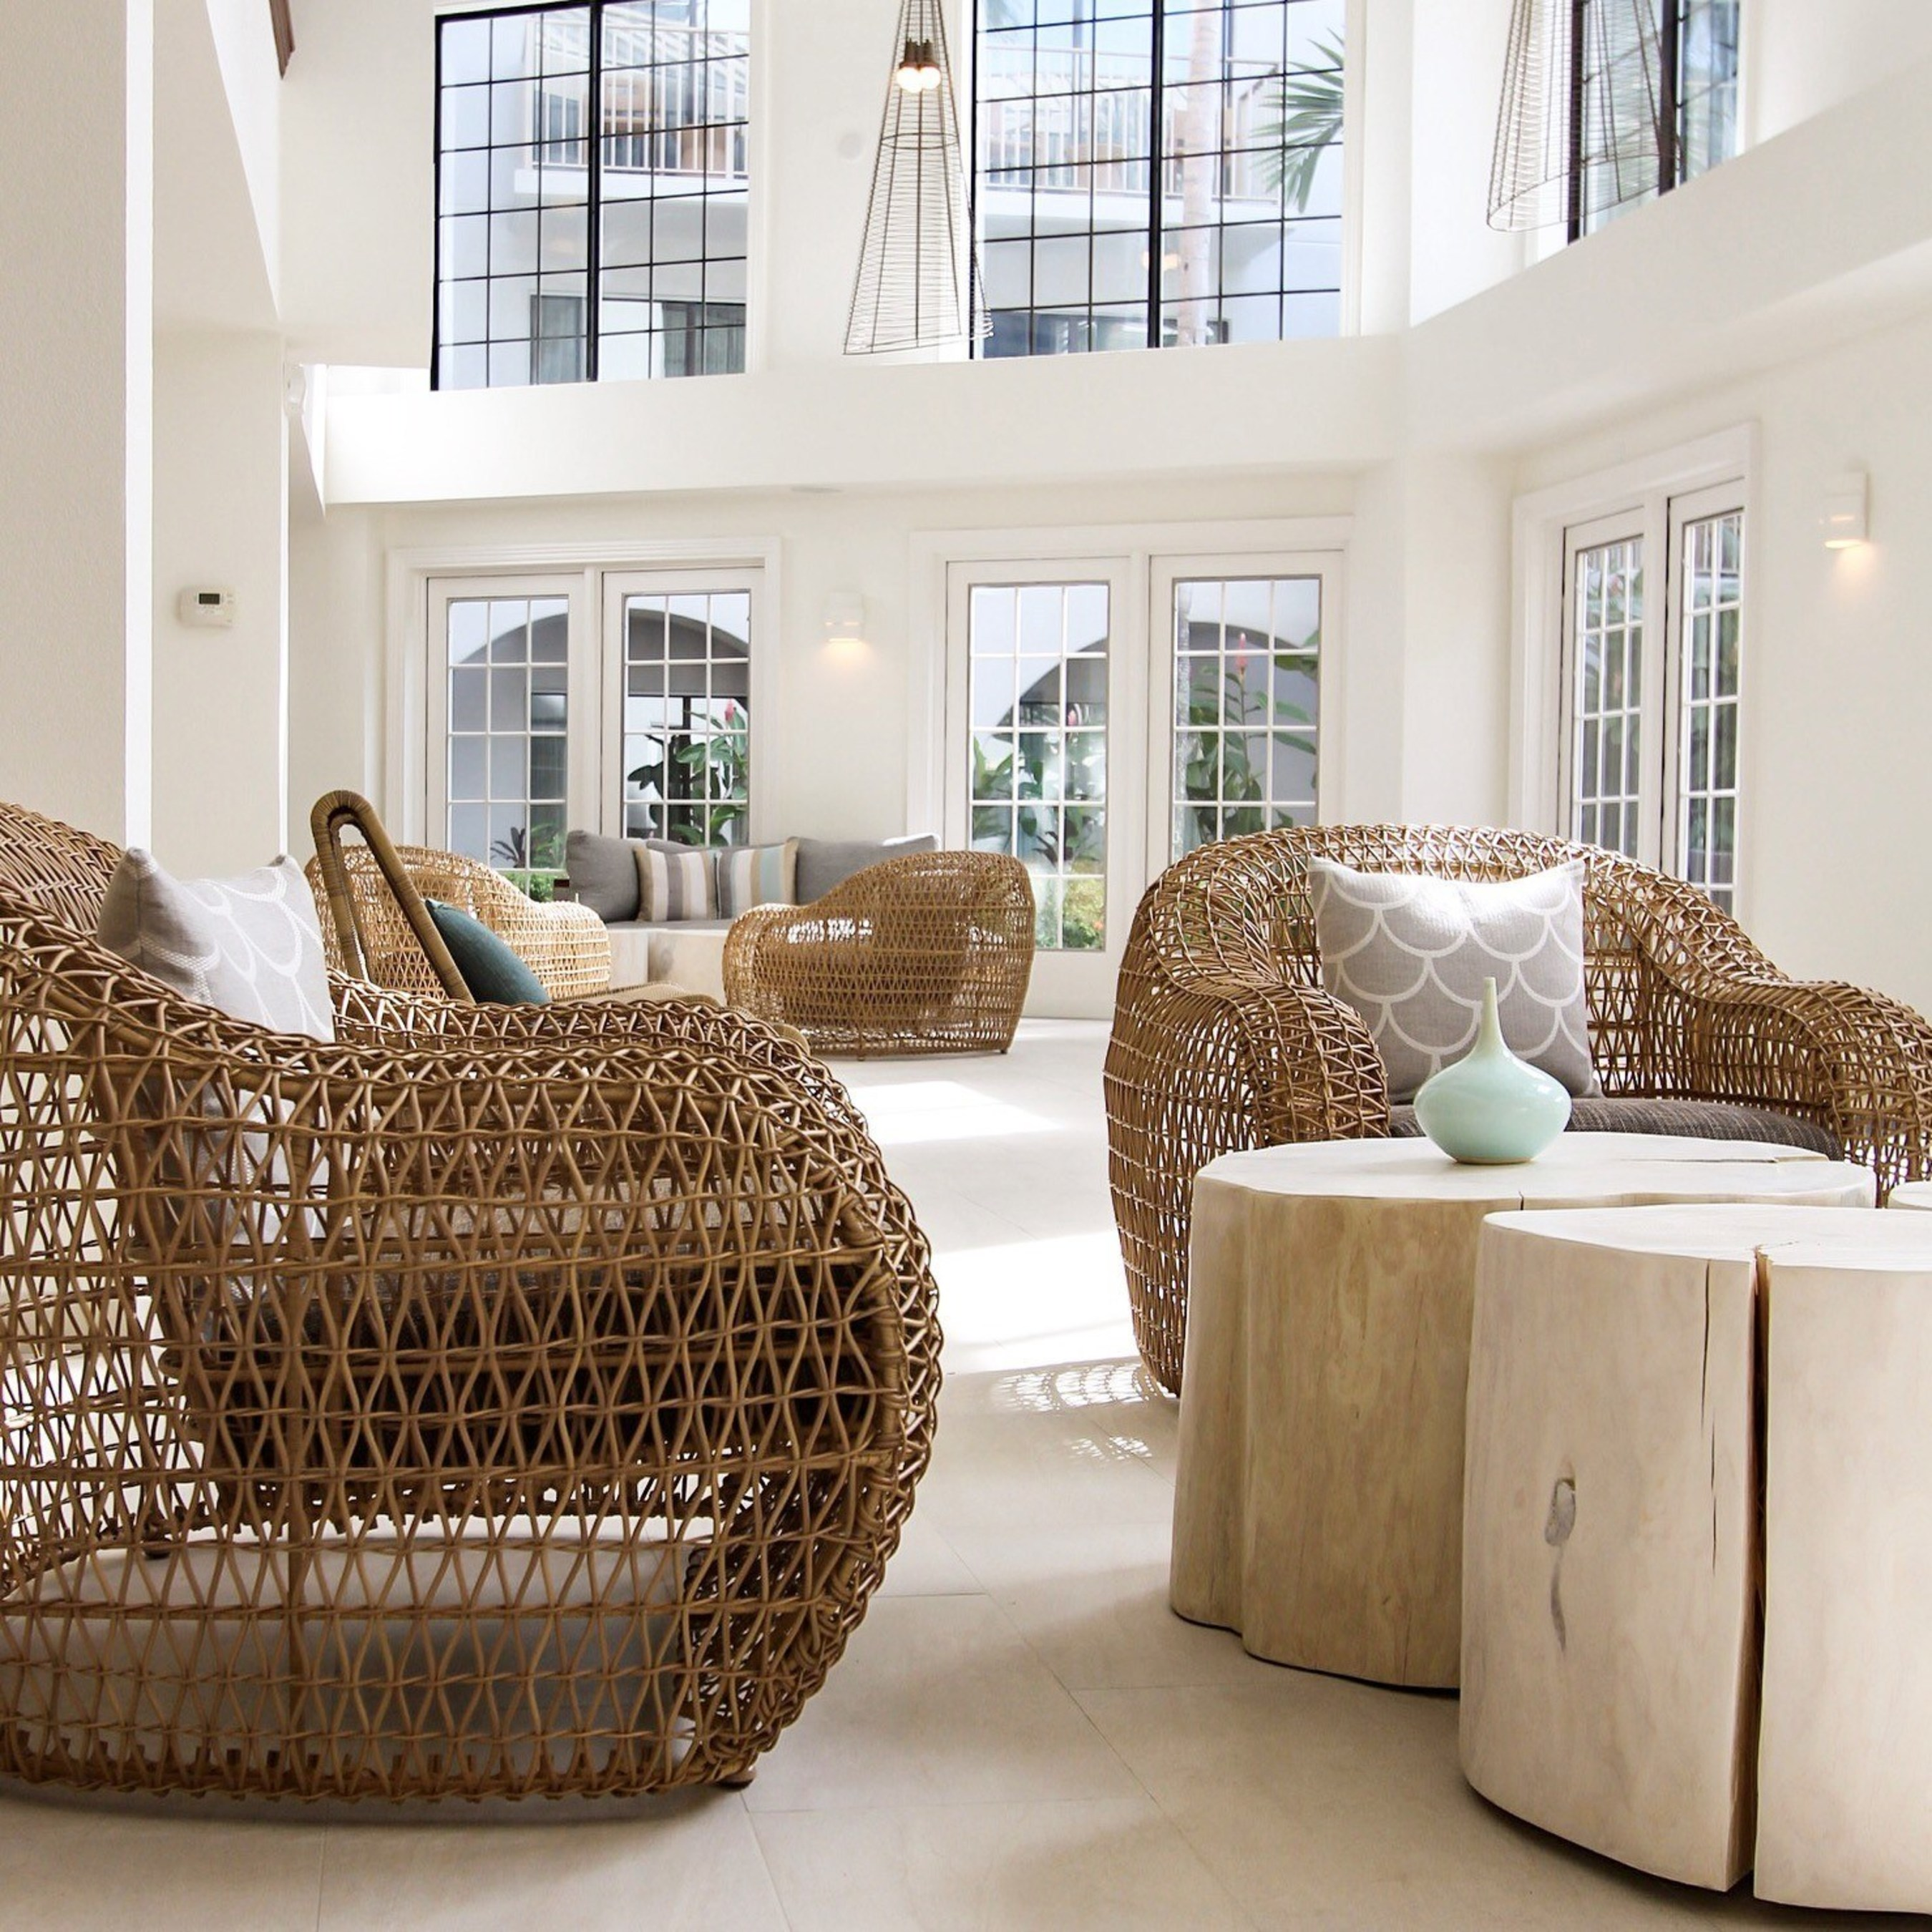 Grand Cayman Marriott Beach Resort Completes 16M Renovation Of